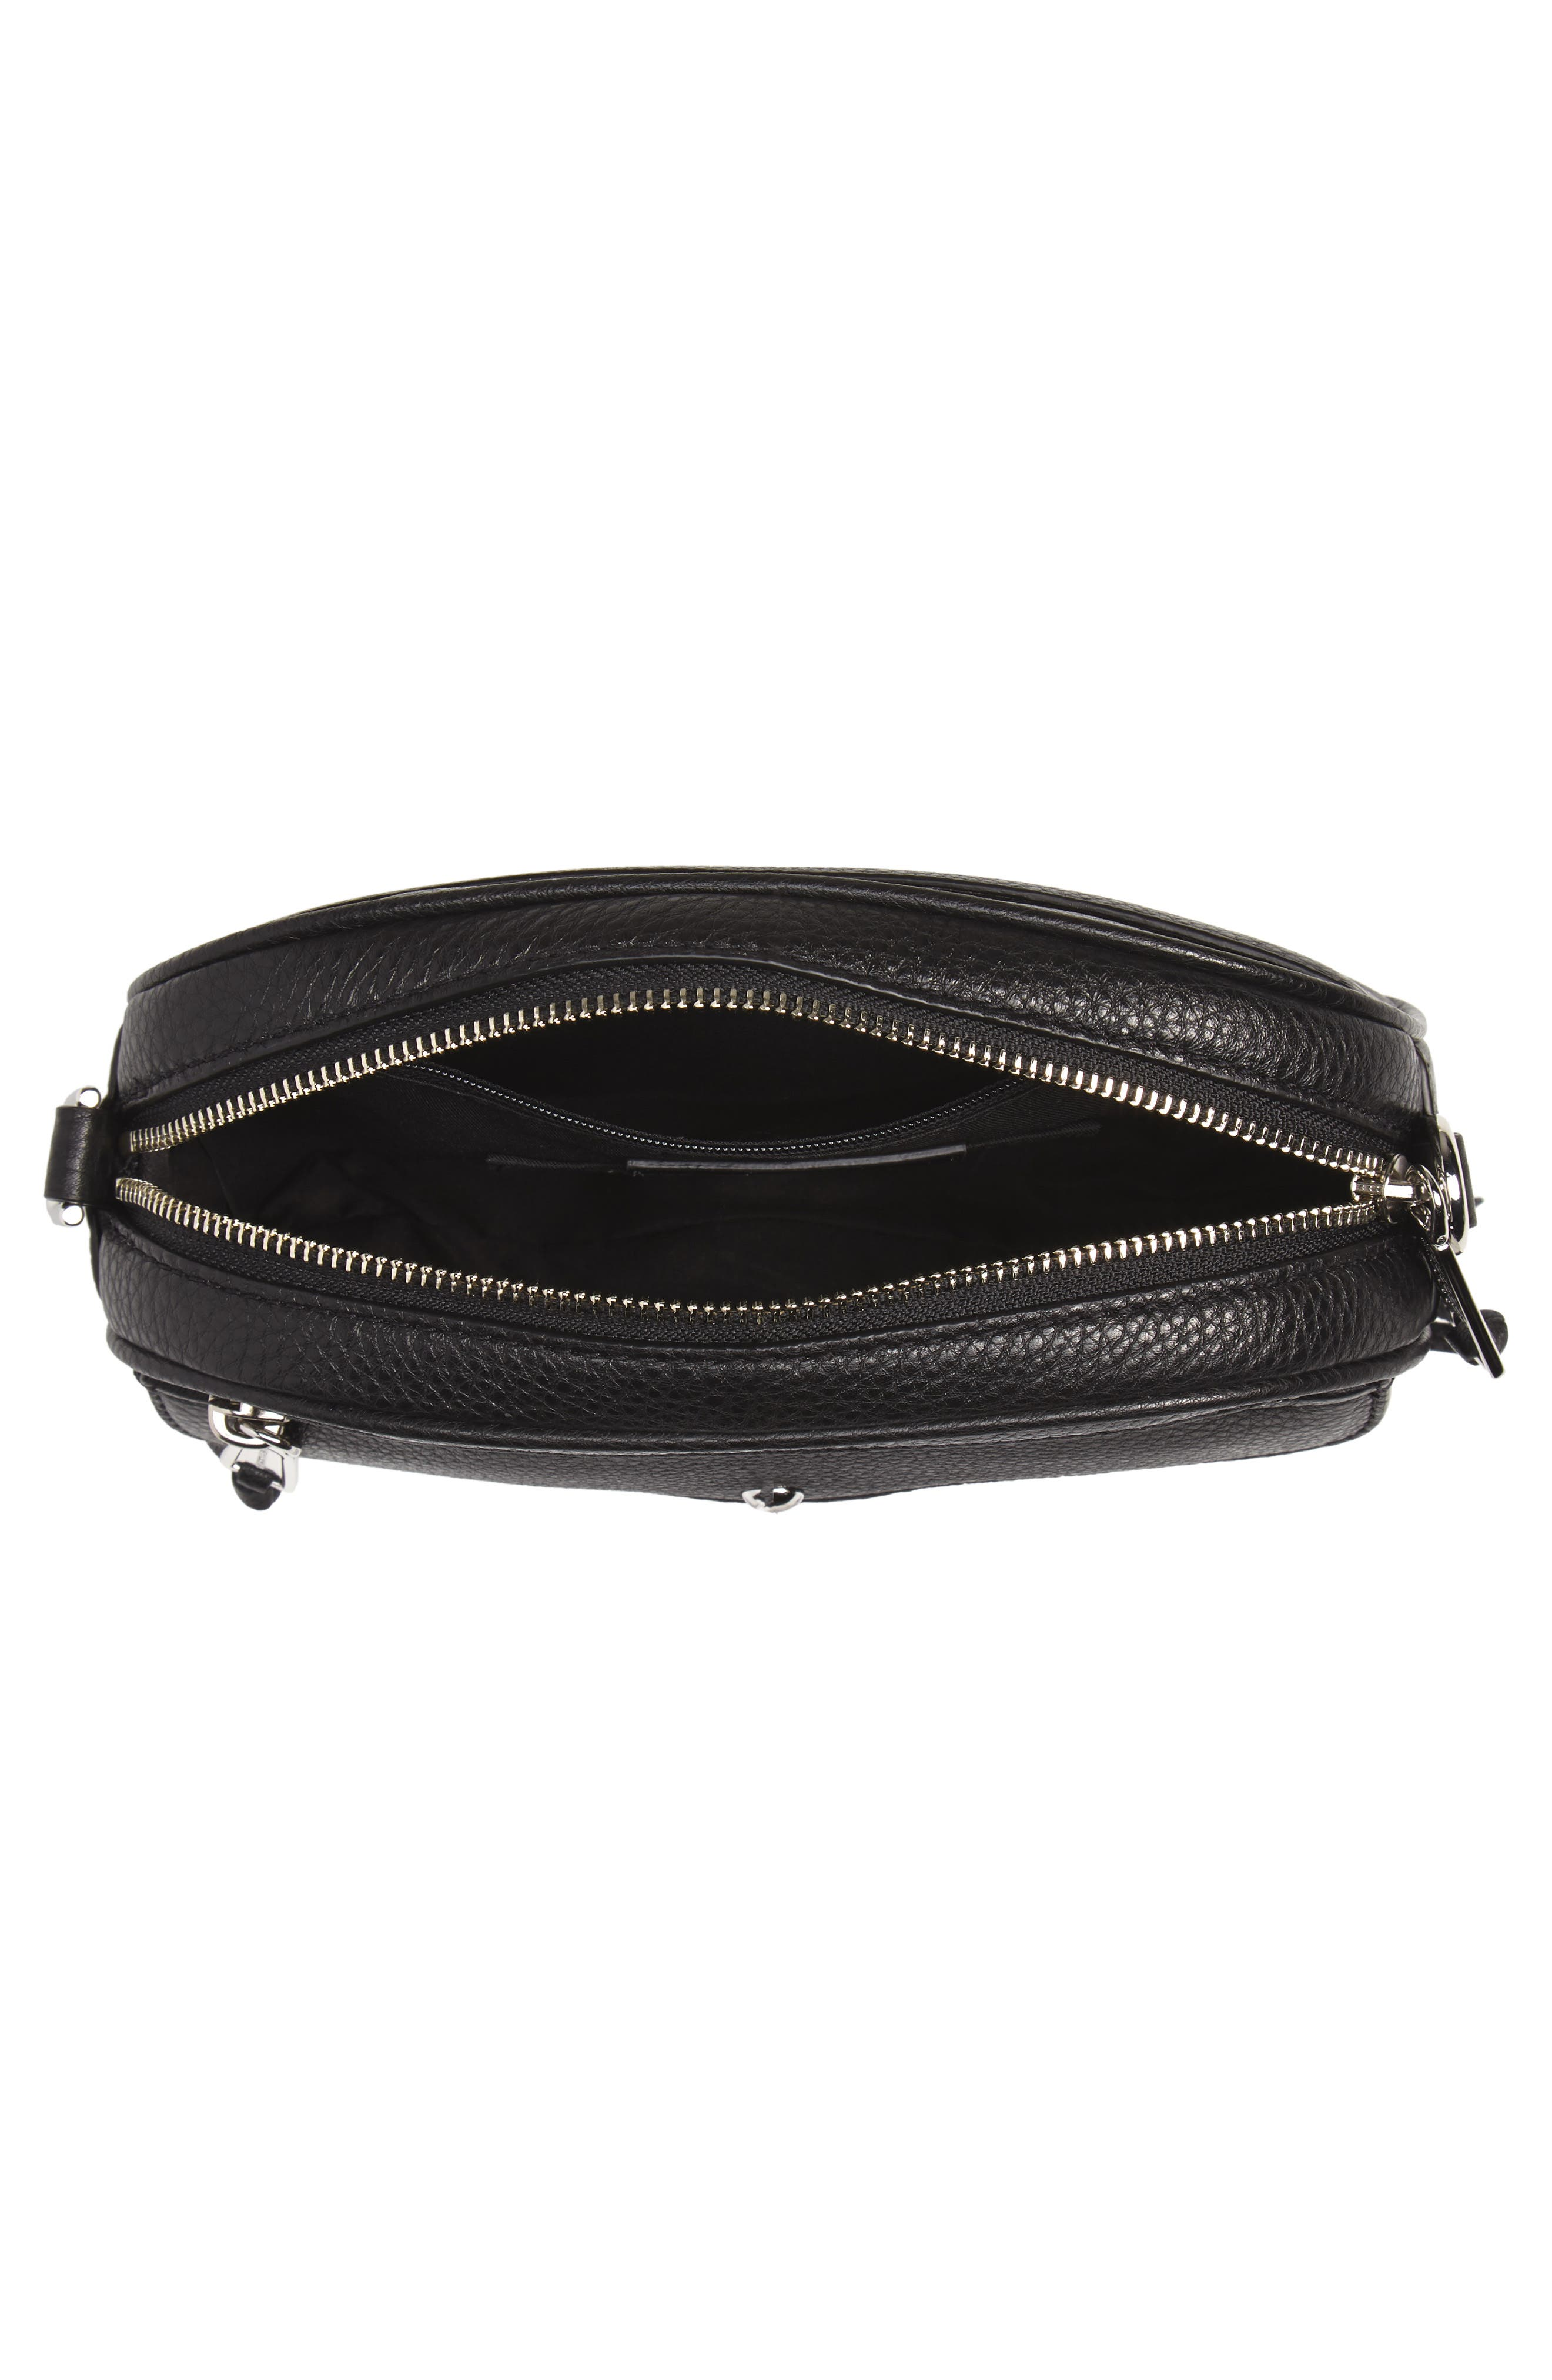 REBECCA MINKOFF, Blythe Leather Crossbody Bag, Alternate thumbnail 5, color, BLACK